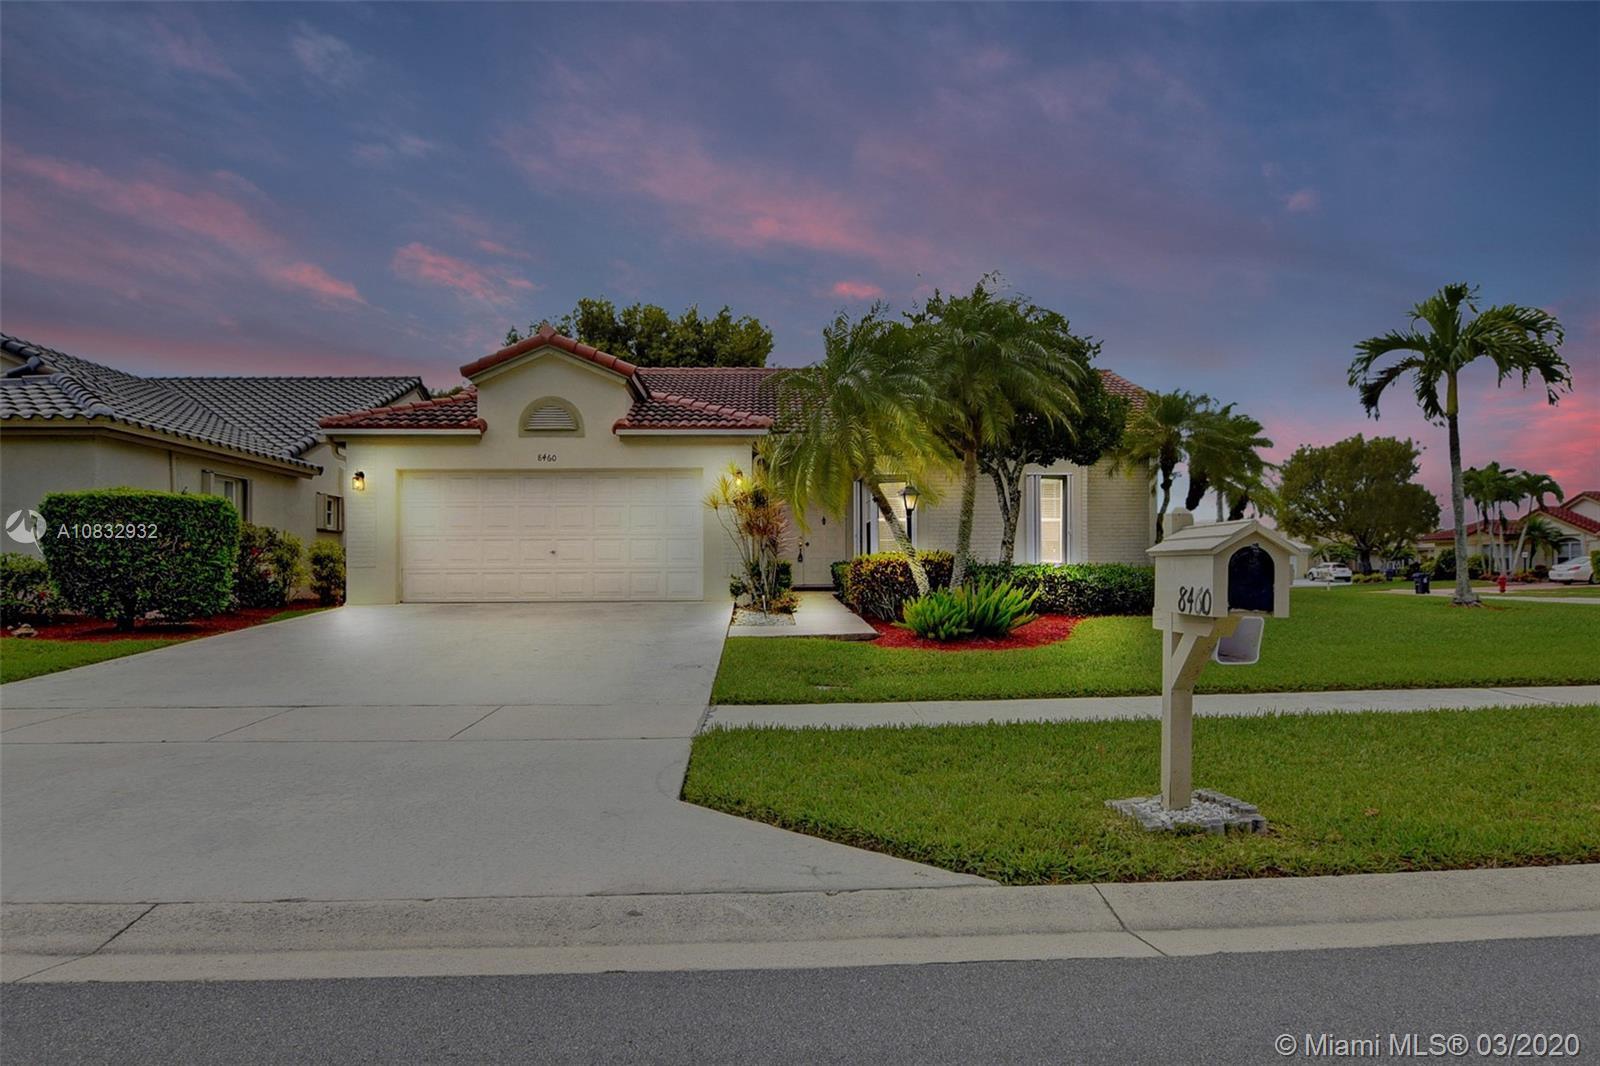 8460 Lake Cypress Rd, Lake Worth, FL 33467 - Lake Worth, FL real estate listing